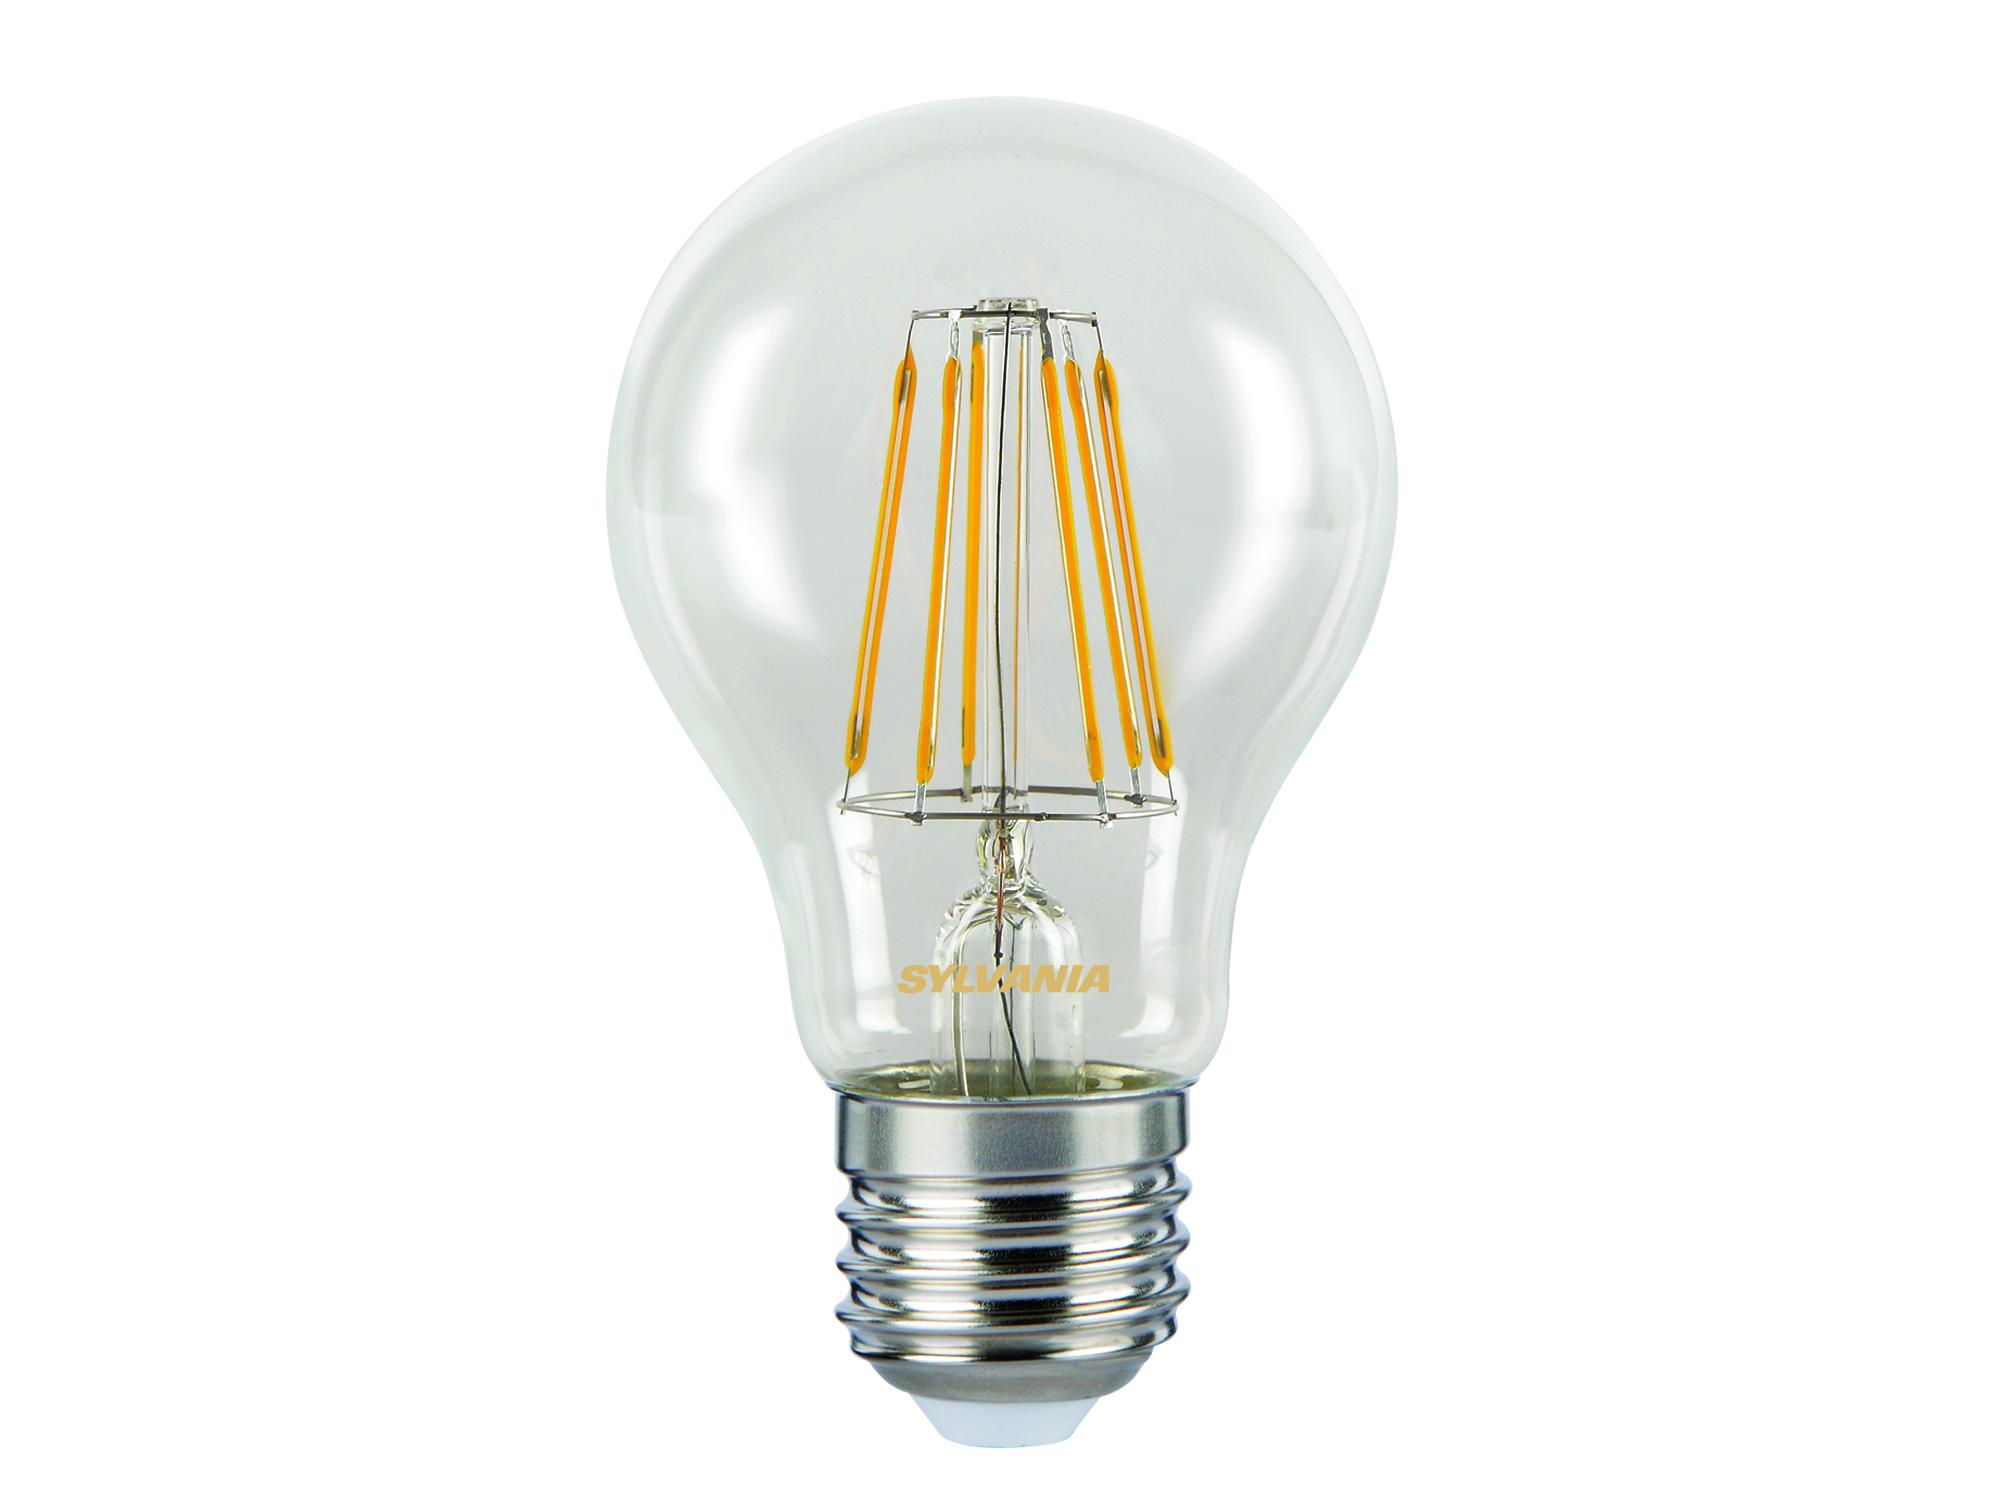 Retro Lampen Led : Led lampen vergleich neue led lampen in retro filament